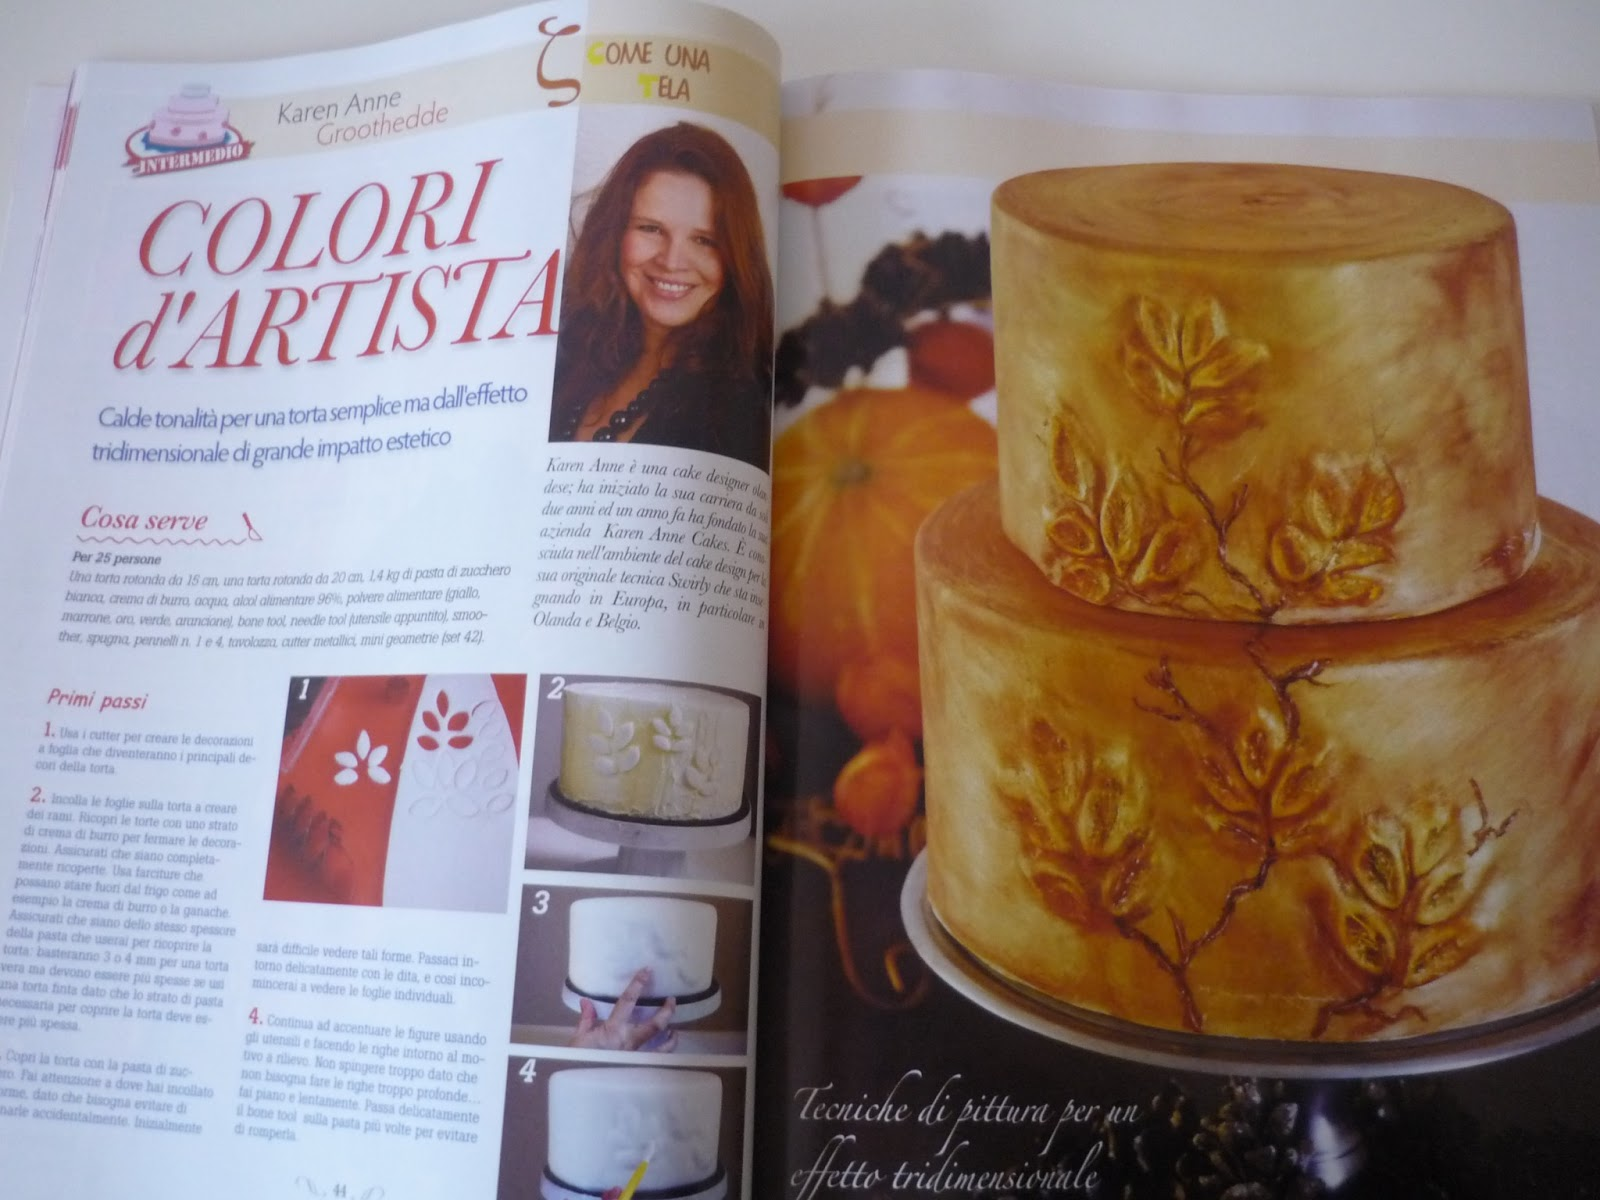 Karen Anne Cakes: Karen Anne Cakes in Cucina Chic Cake ...